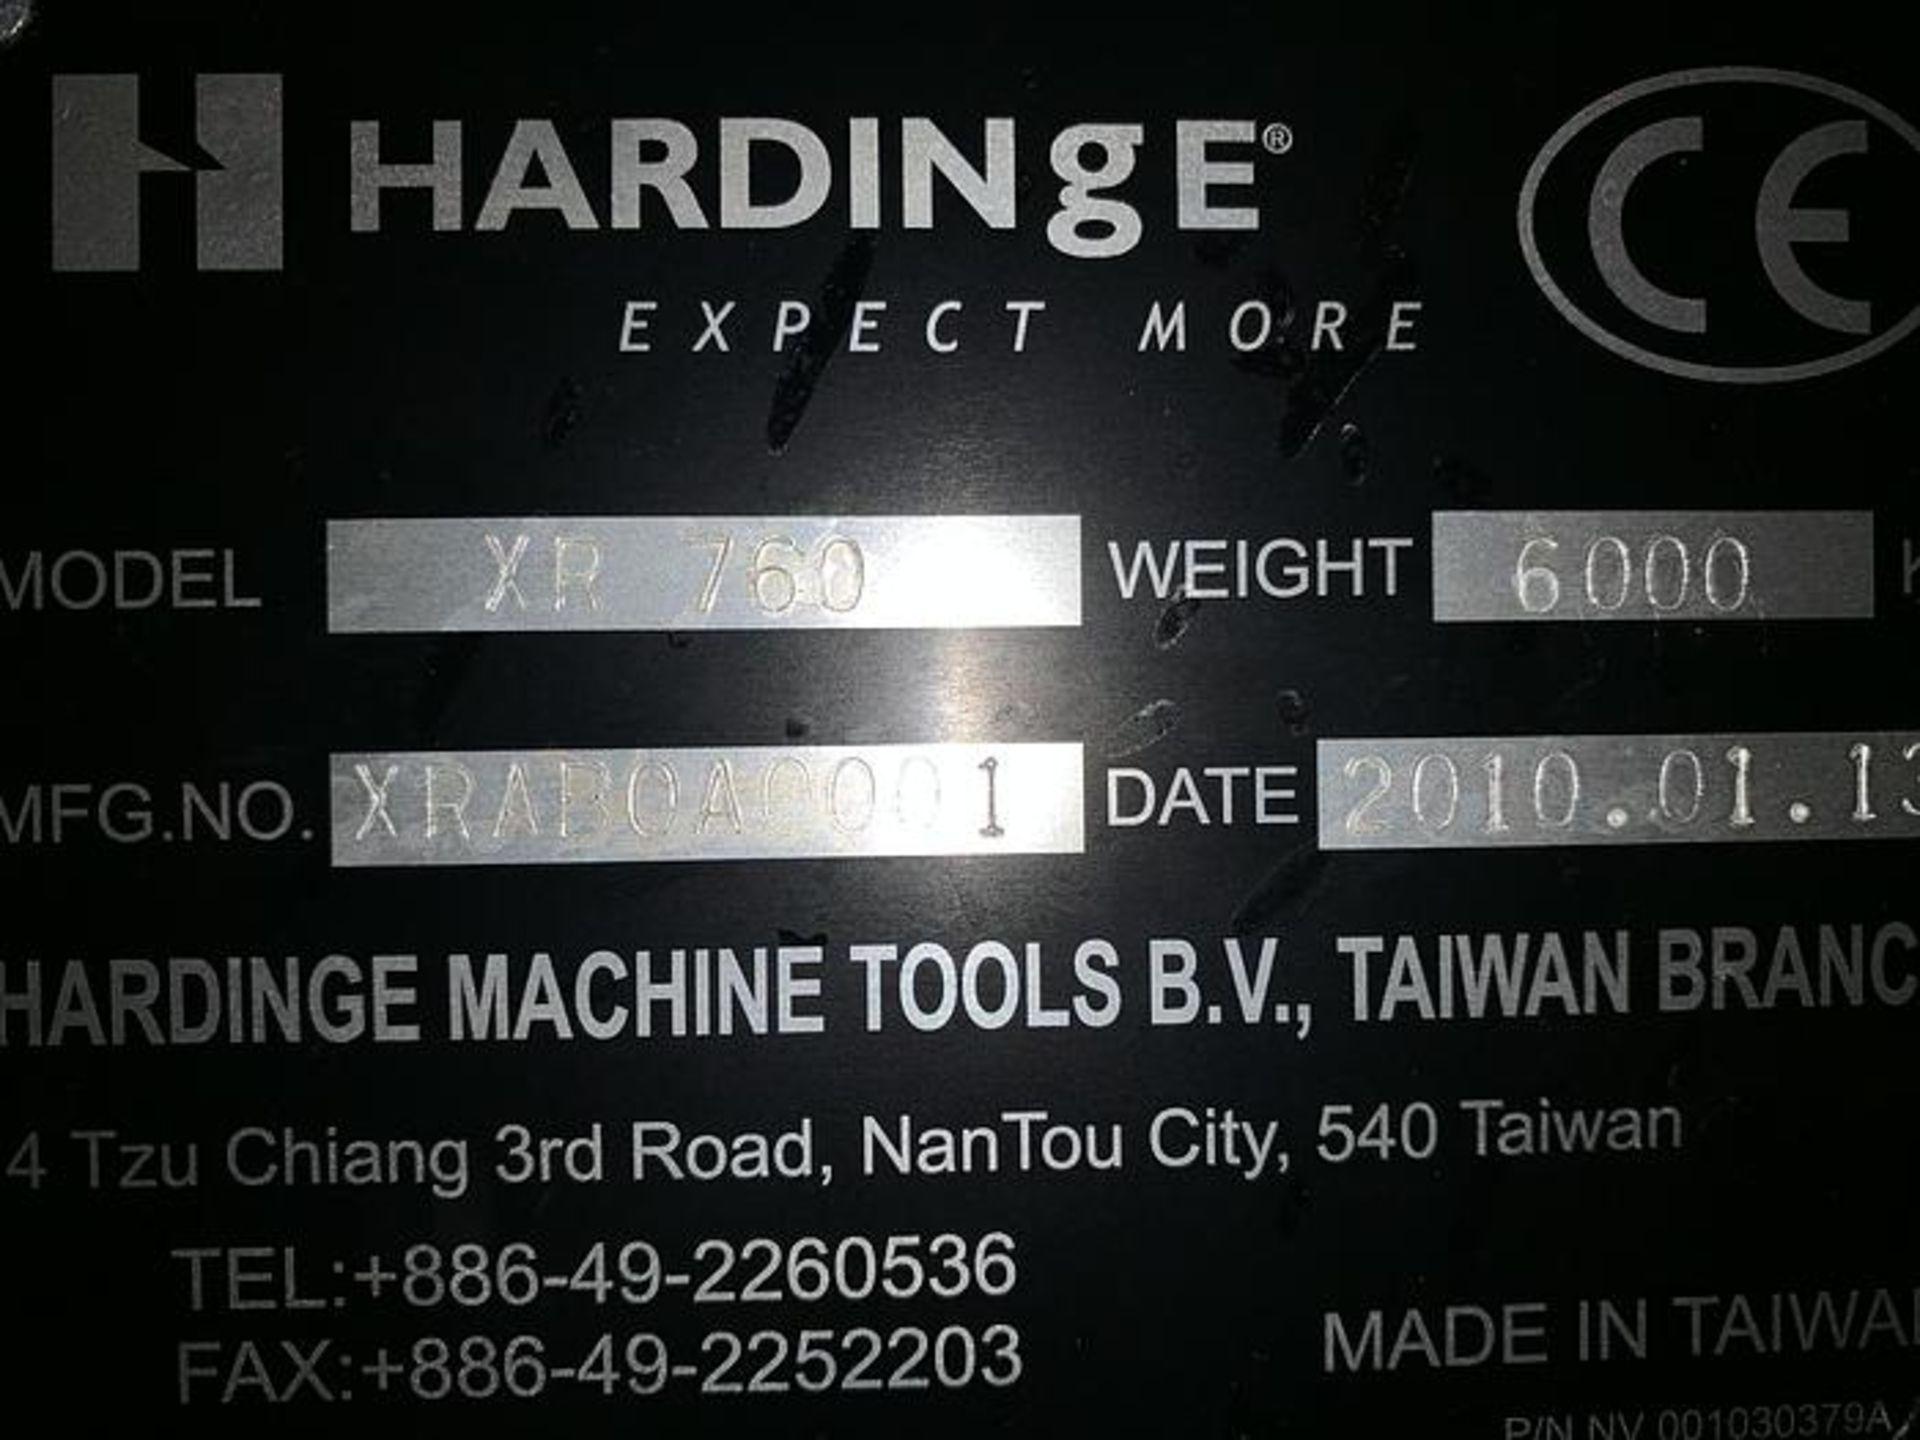 "HARDINGE XR760 CNC VMC PRODUCTION CENTER 30""X24""X24"", YEAR 2010, SN XRAB0A0001 - Image 12 of 12"